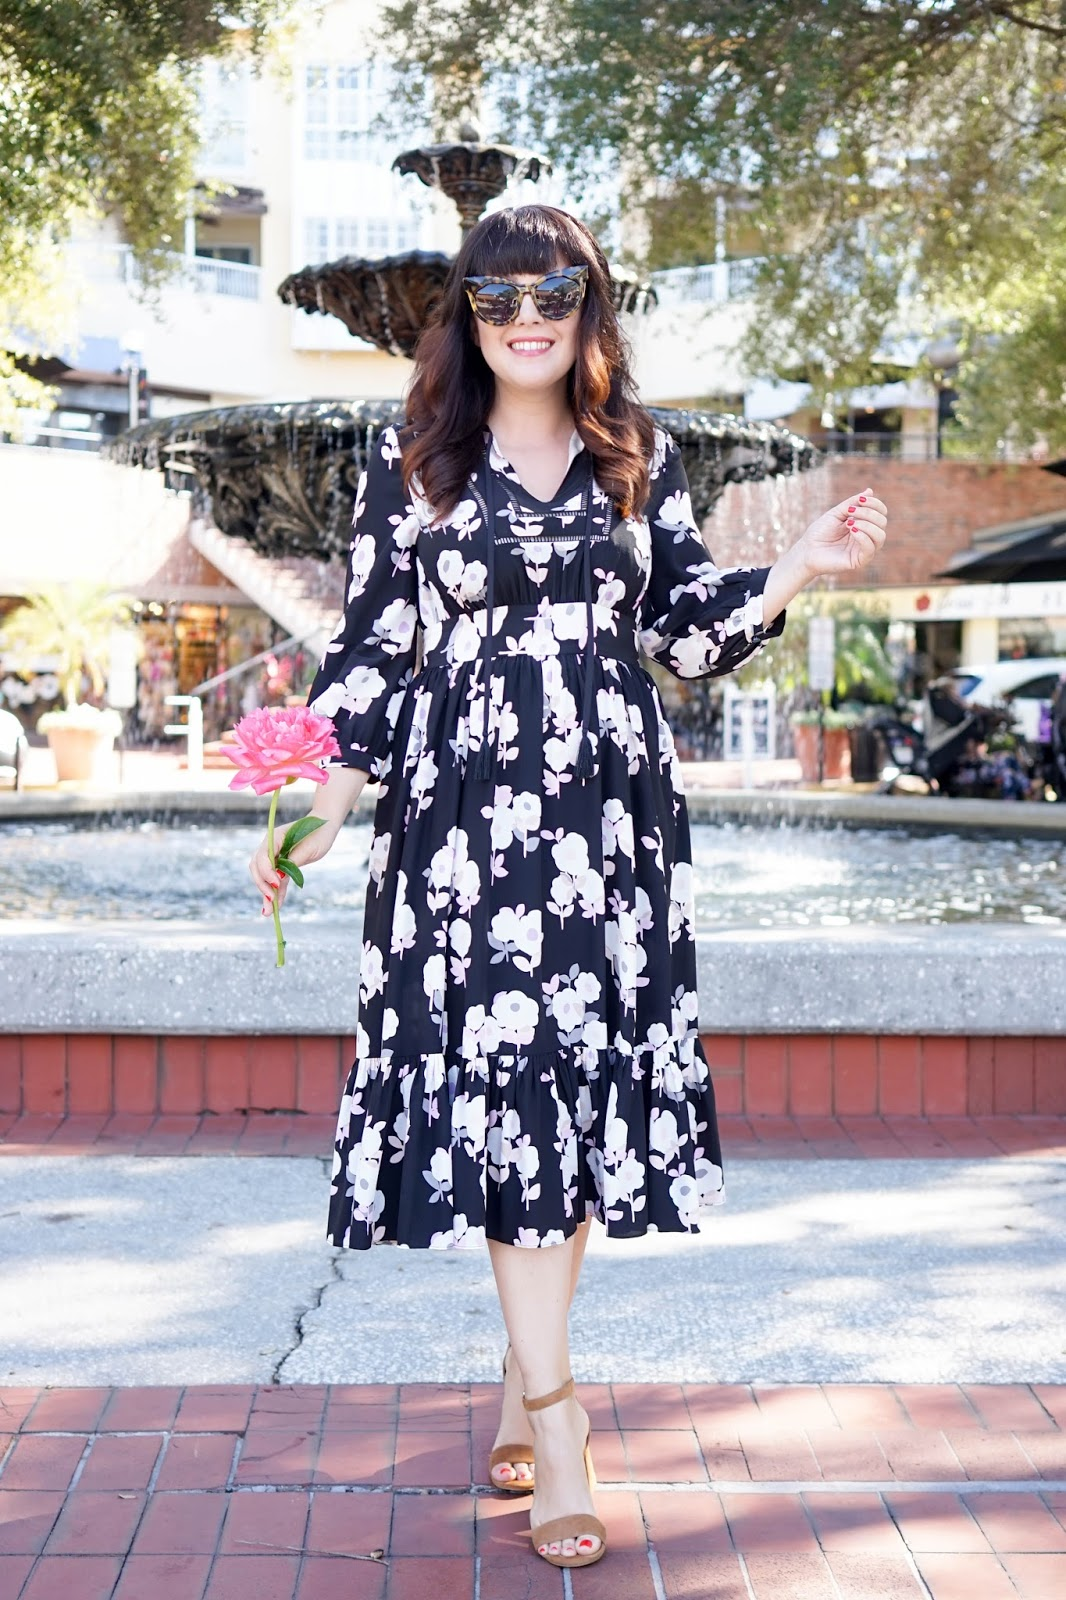 Kate Spade Dress, Hyde Park Village, Tampa